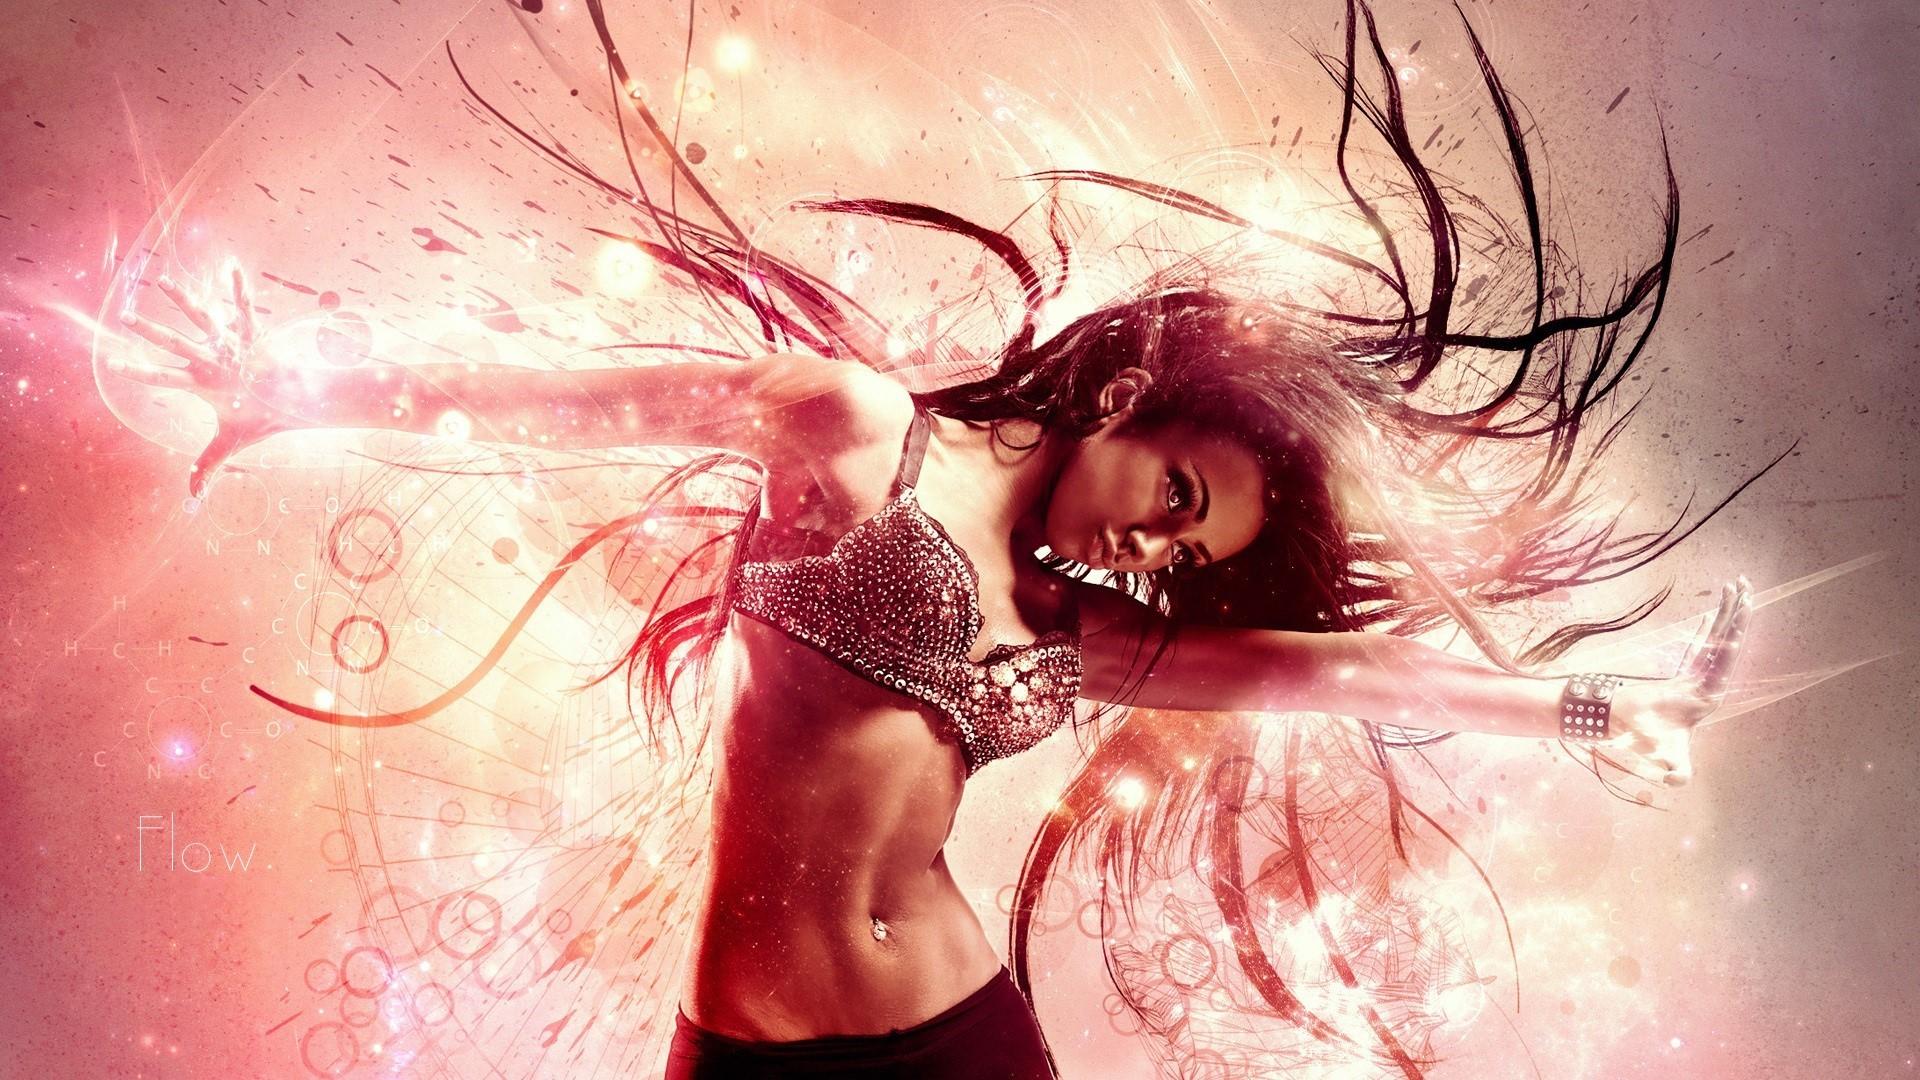 Erotic Dance Girl Hd